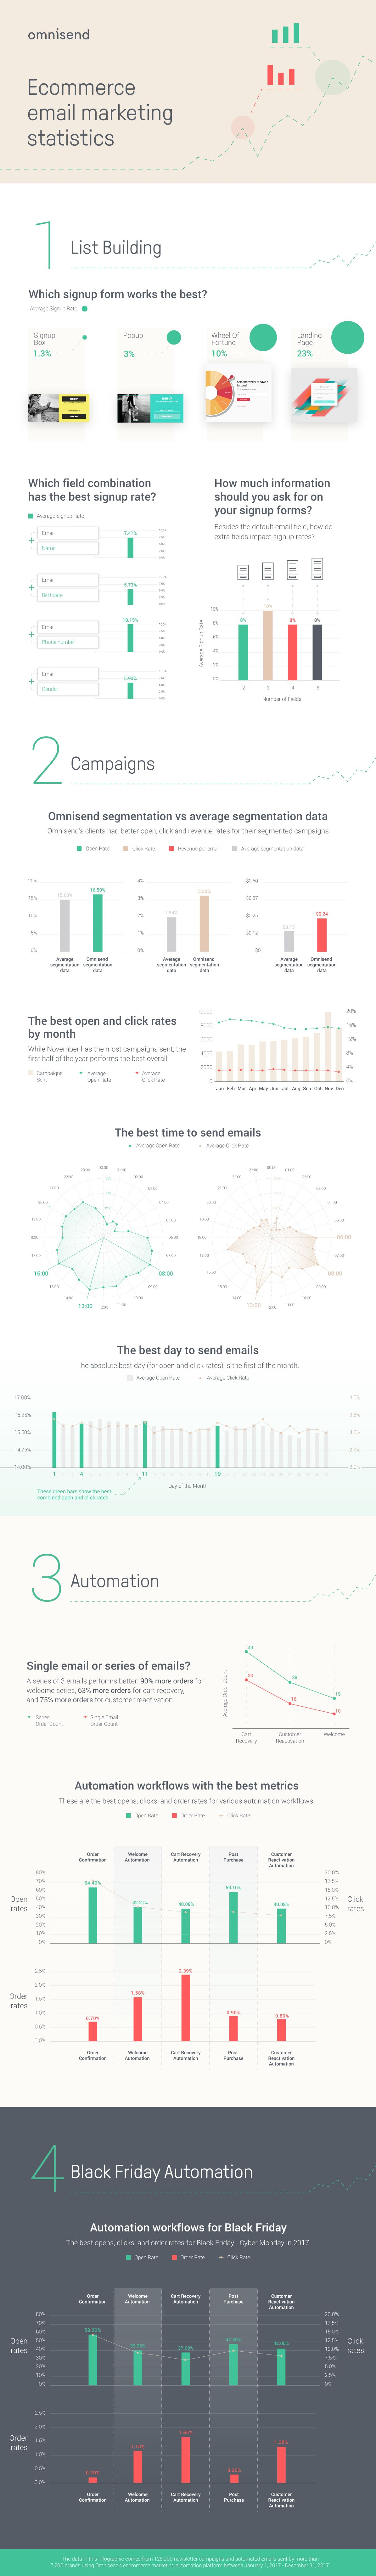 Ecommerce-Email-Marketing-Infographic